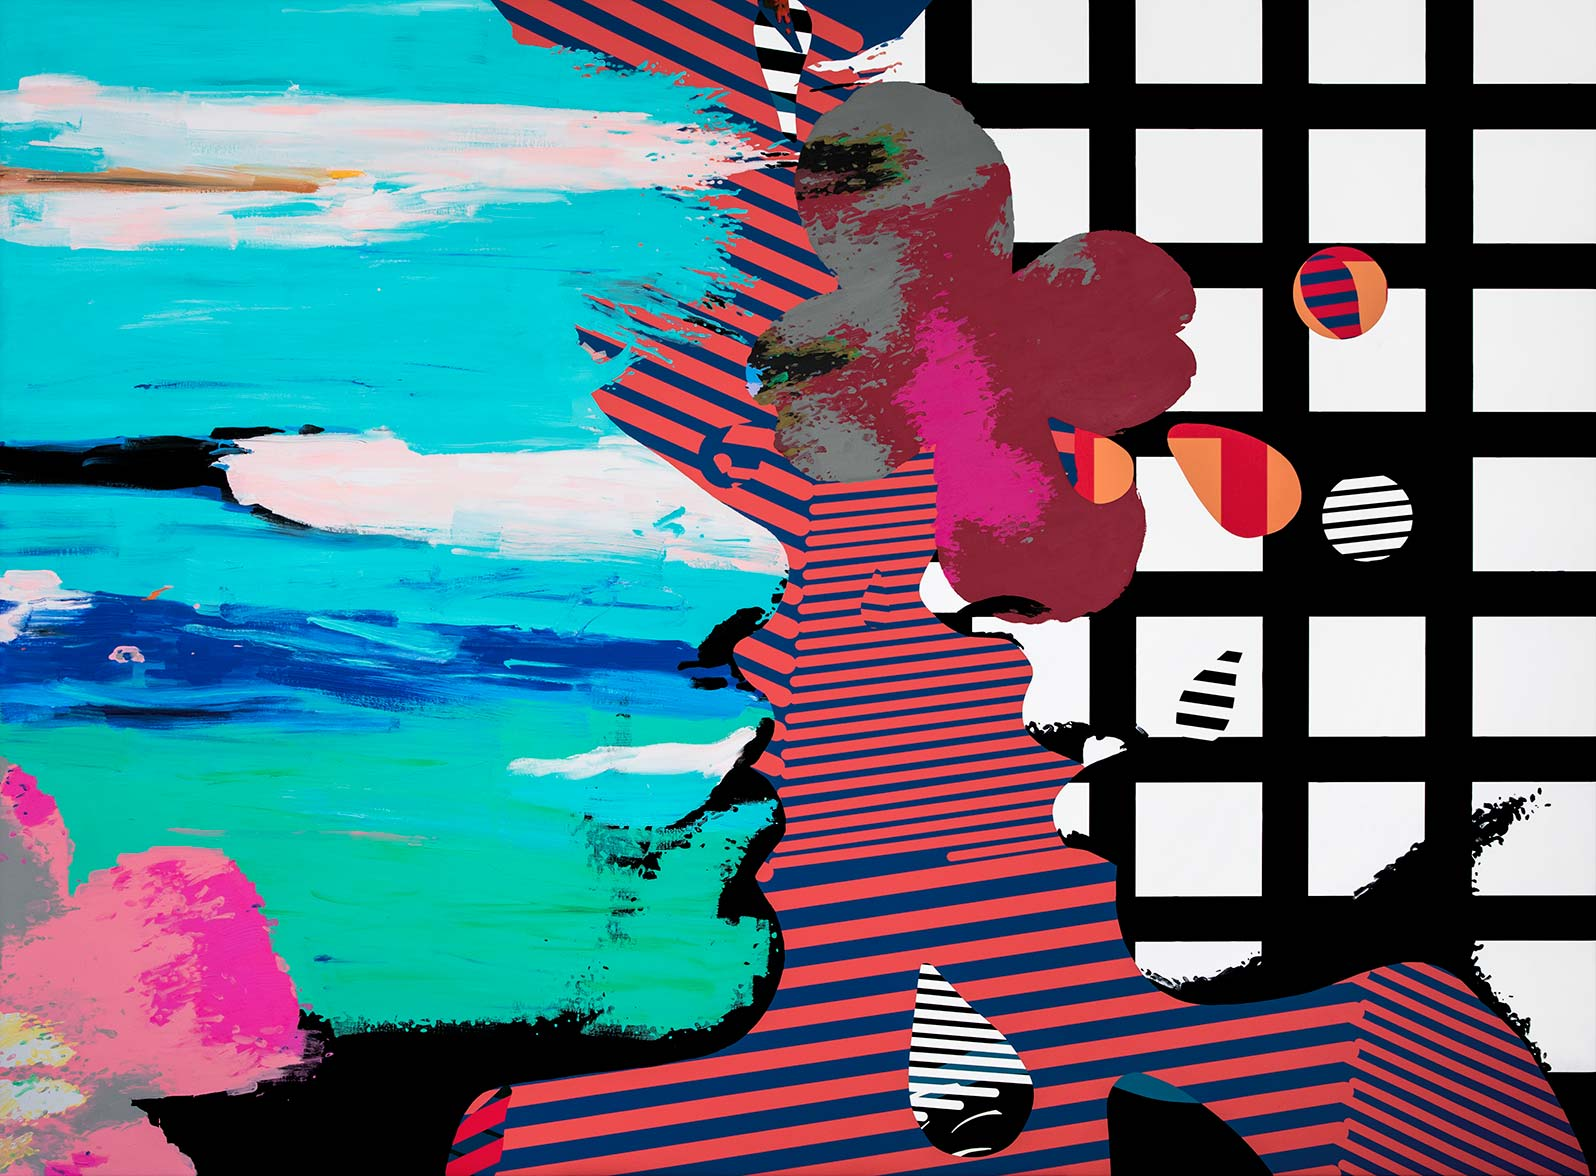 Anca Stefanescu | Mixed Media | Defenselessness, Modern Art Acrylic Paintings